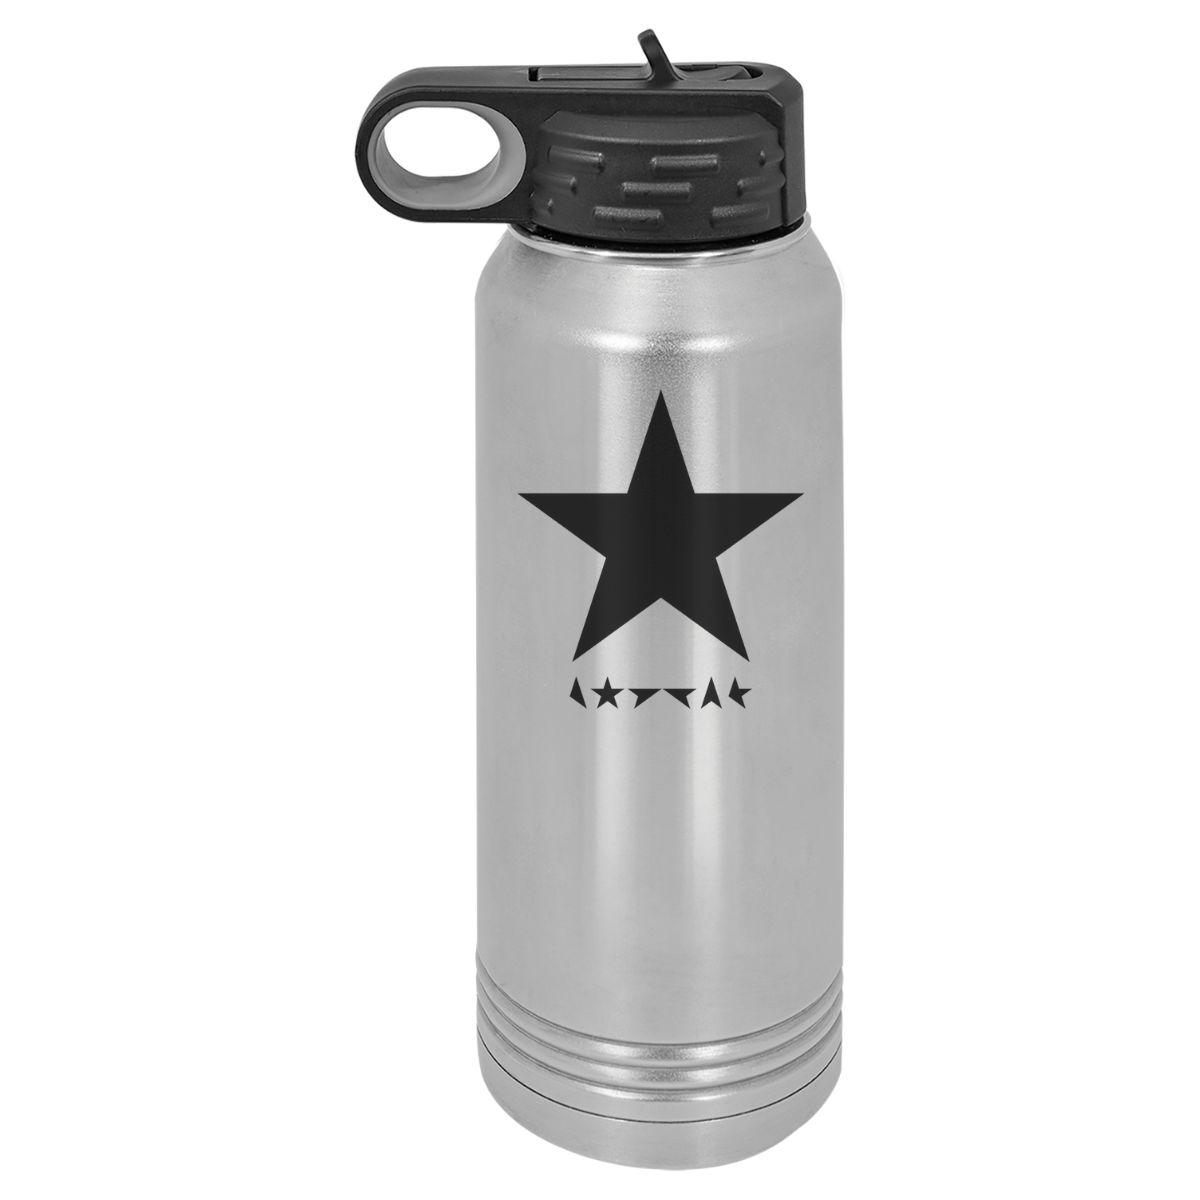 Blackstar Polar Camel Water Bottle